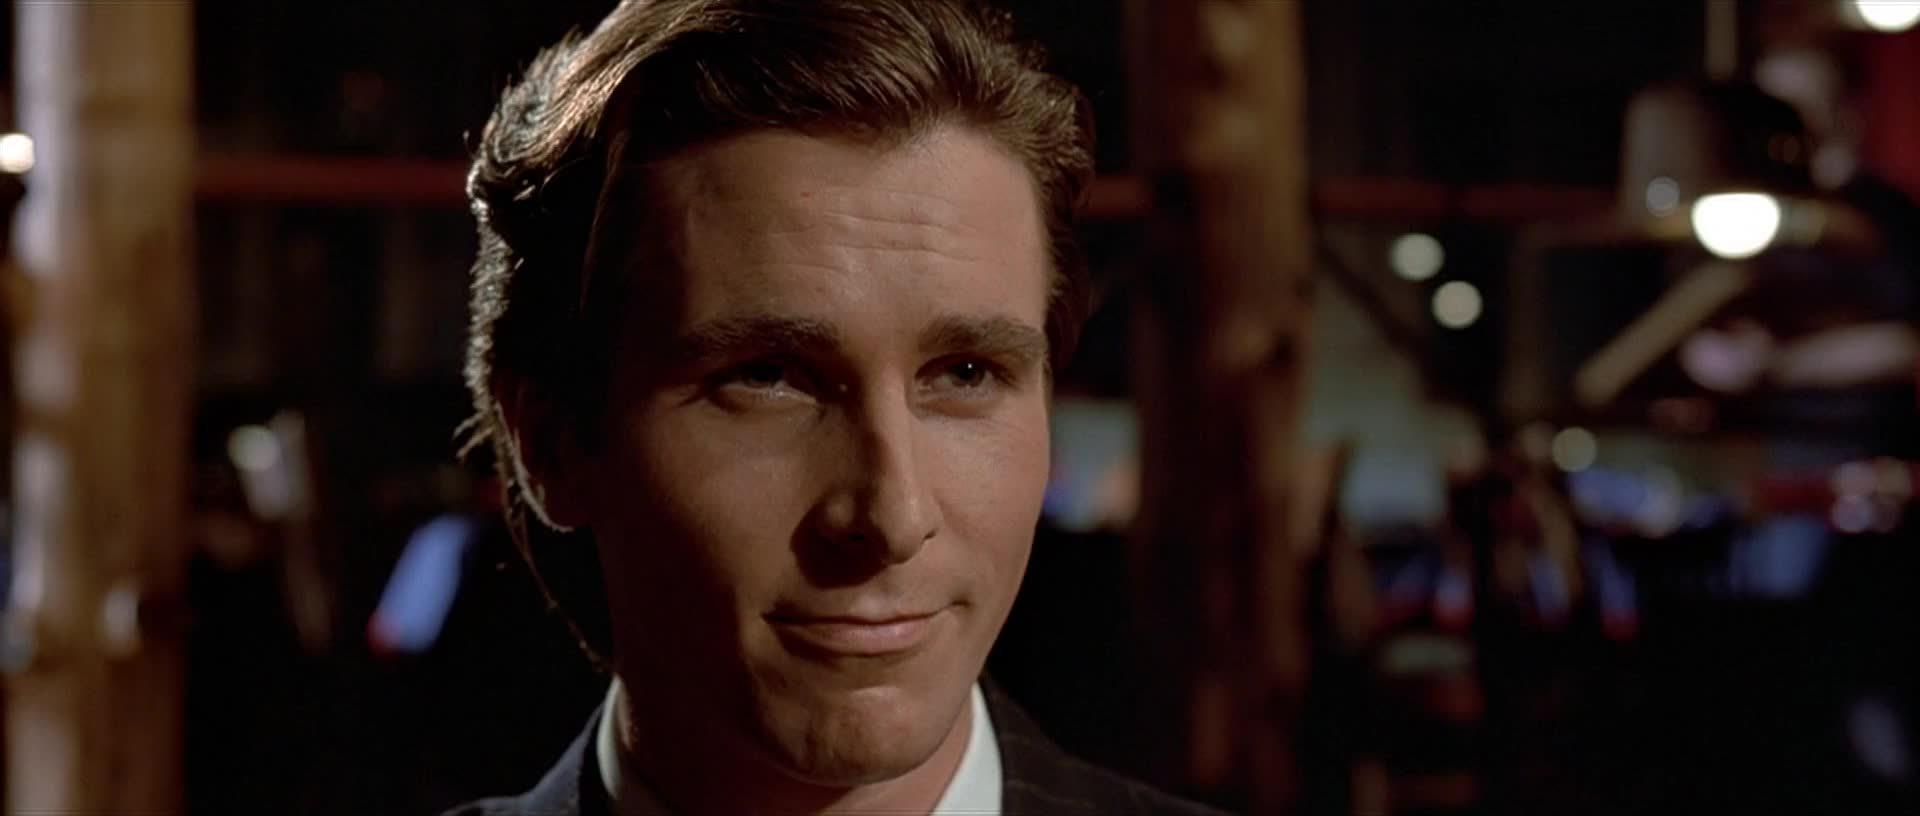 Christian Bale, batmanarkham, losangeleskings, reactiongifs, Untitled GIFs